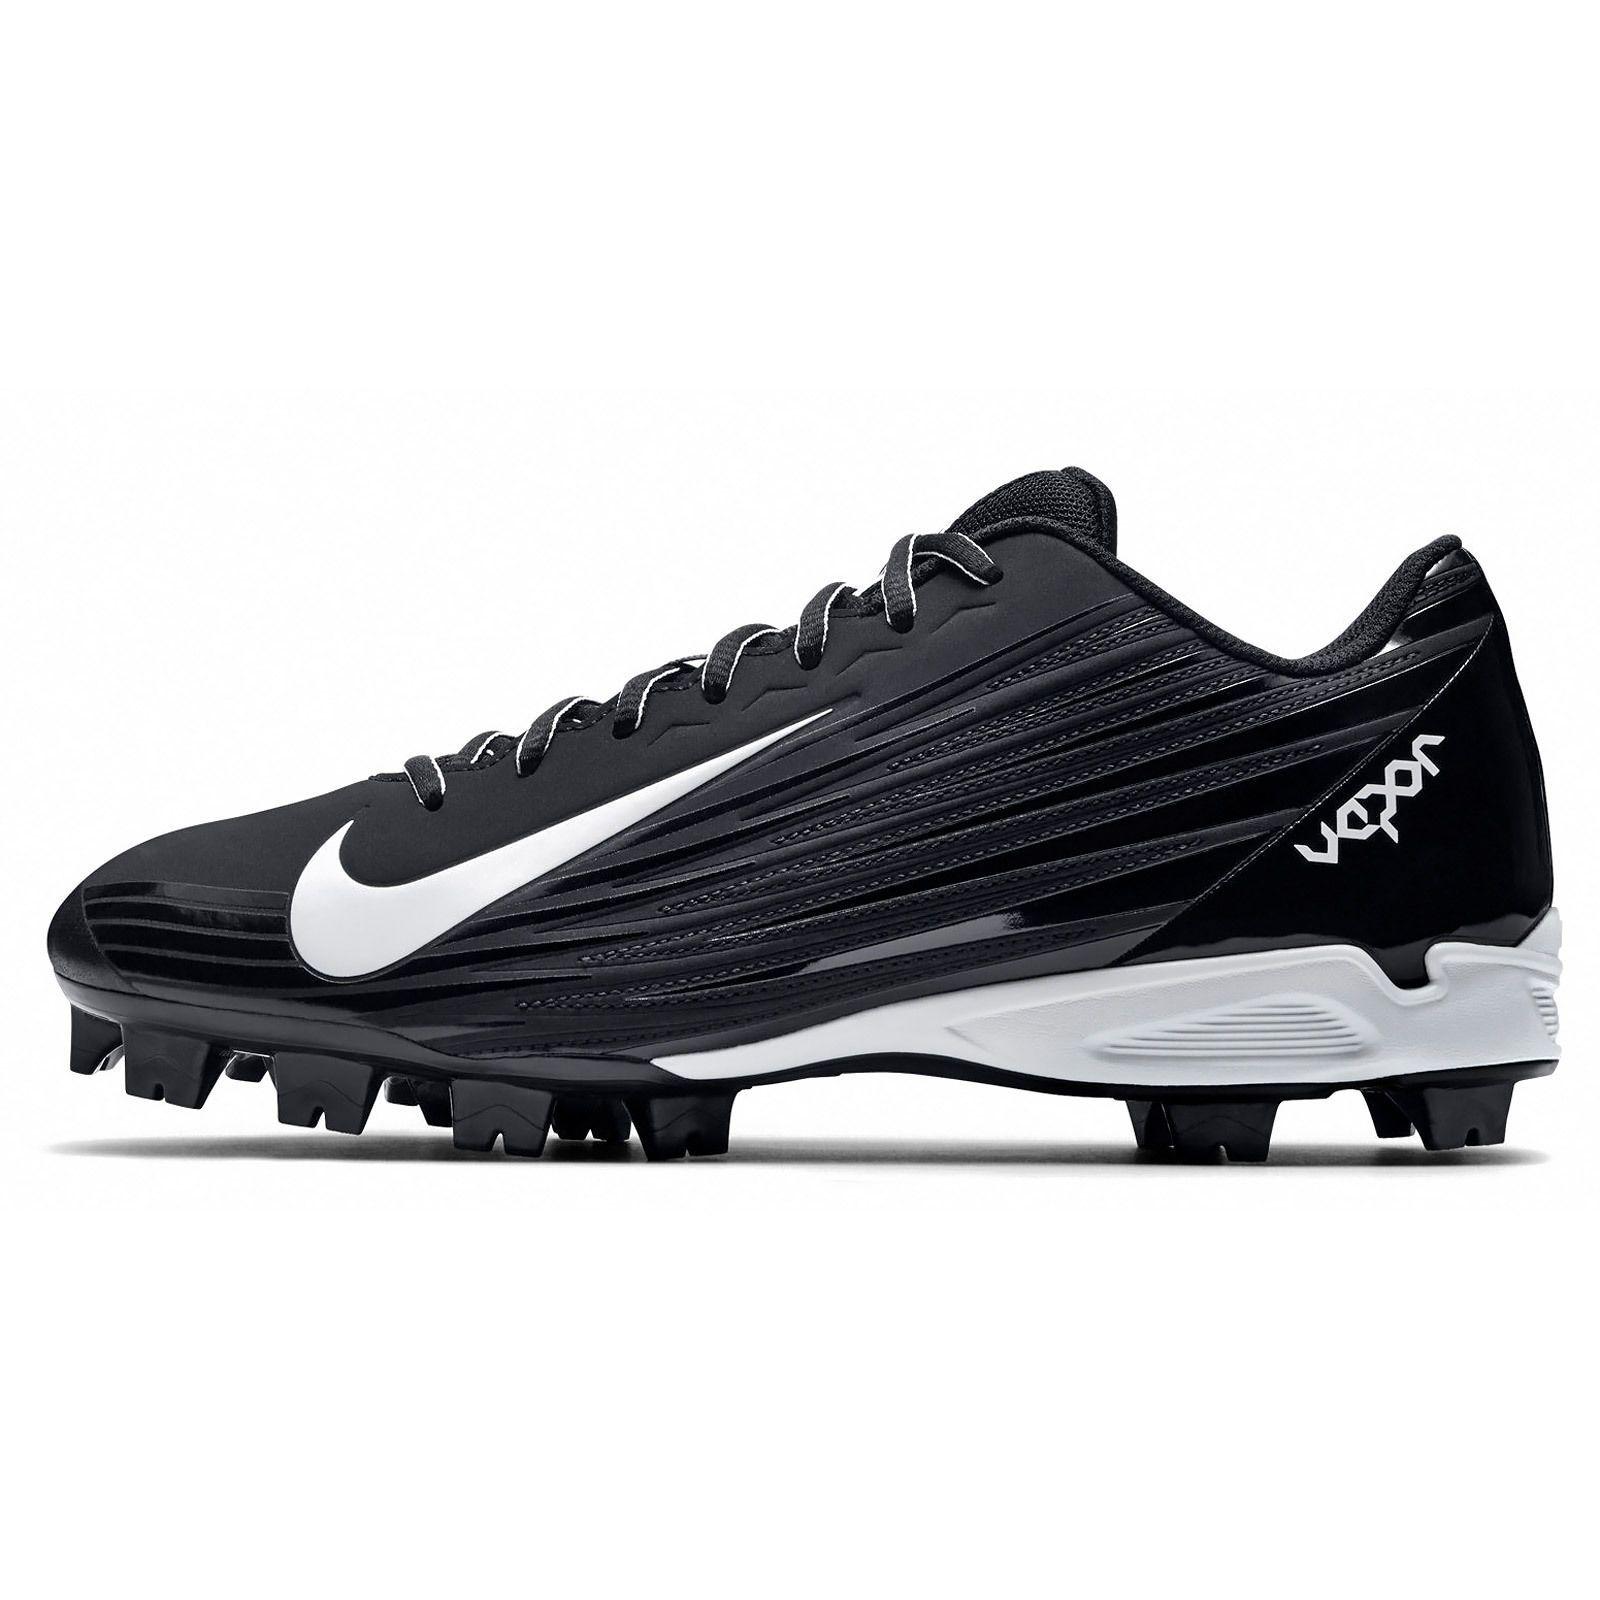 New Nike Vapor Strike 2 MCS Mens Low Baseball Cleats Molded Plastic : Black